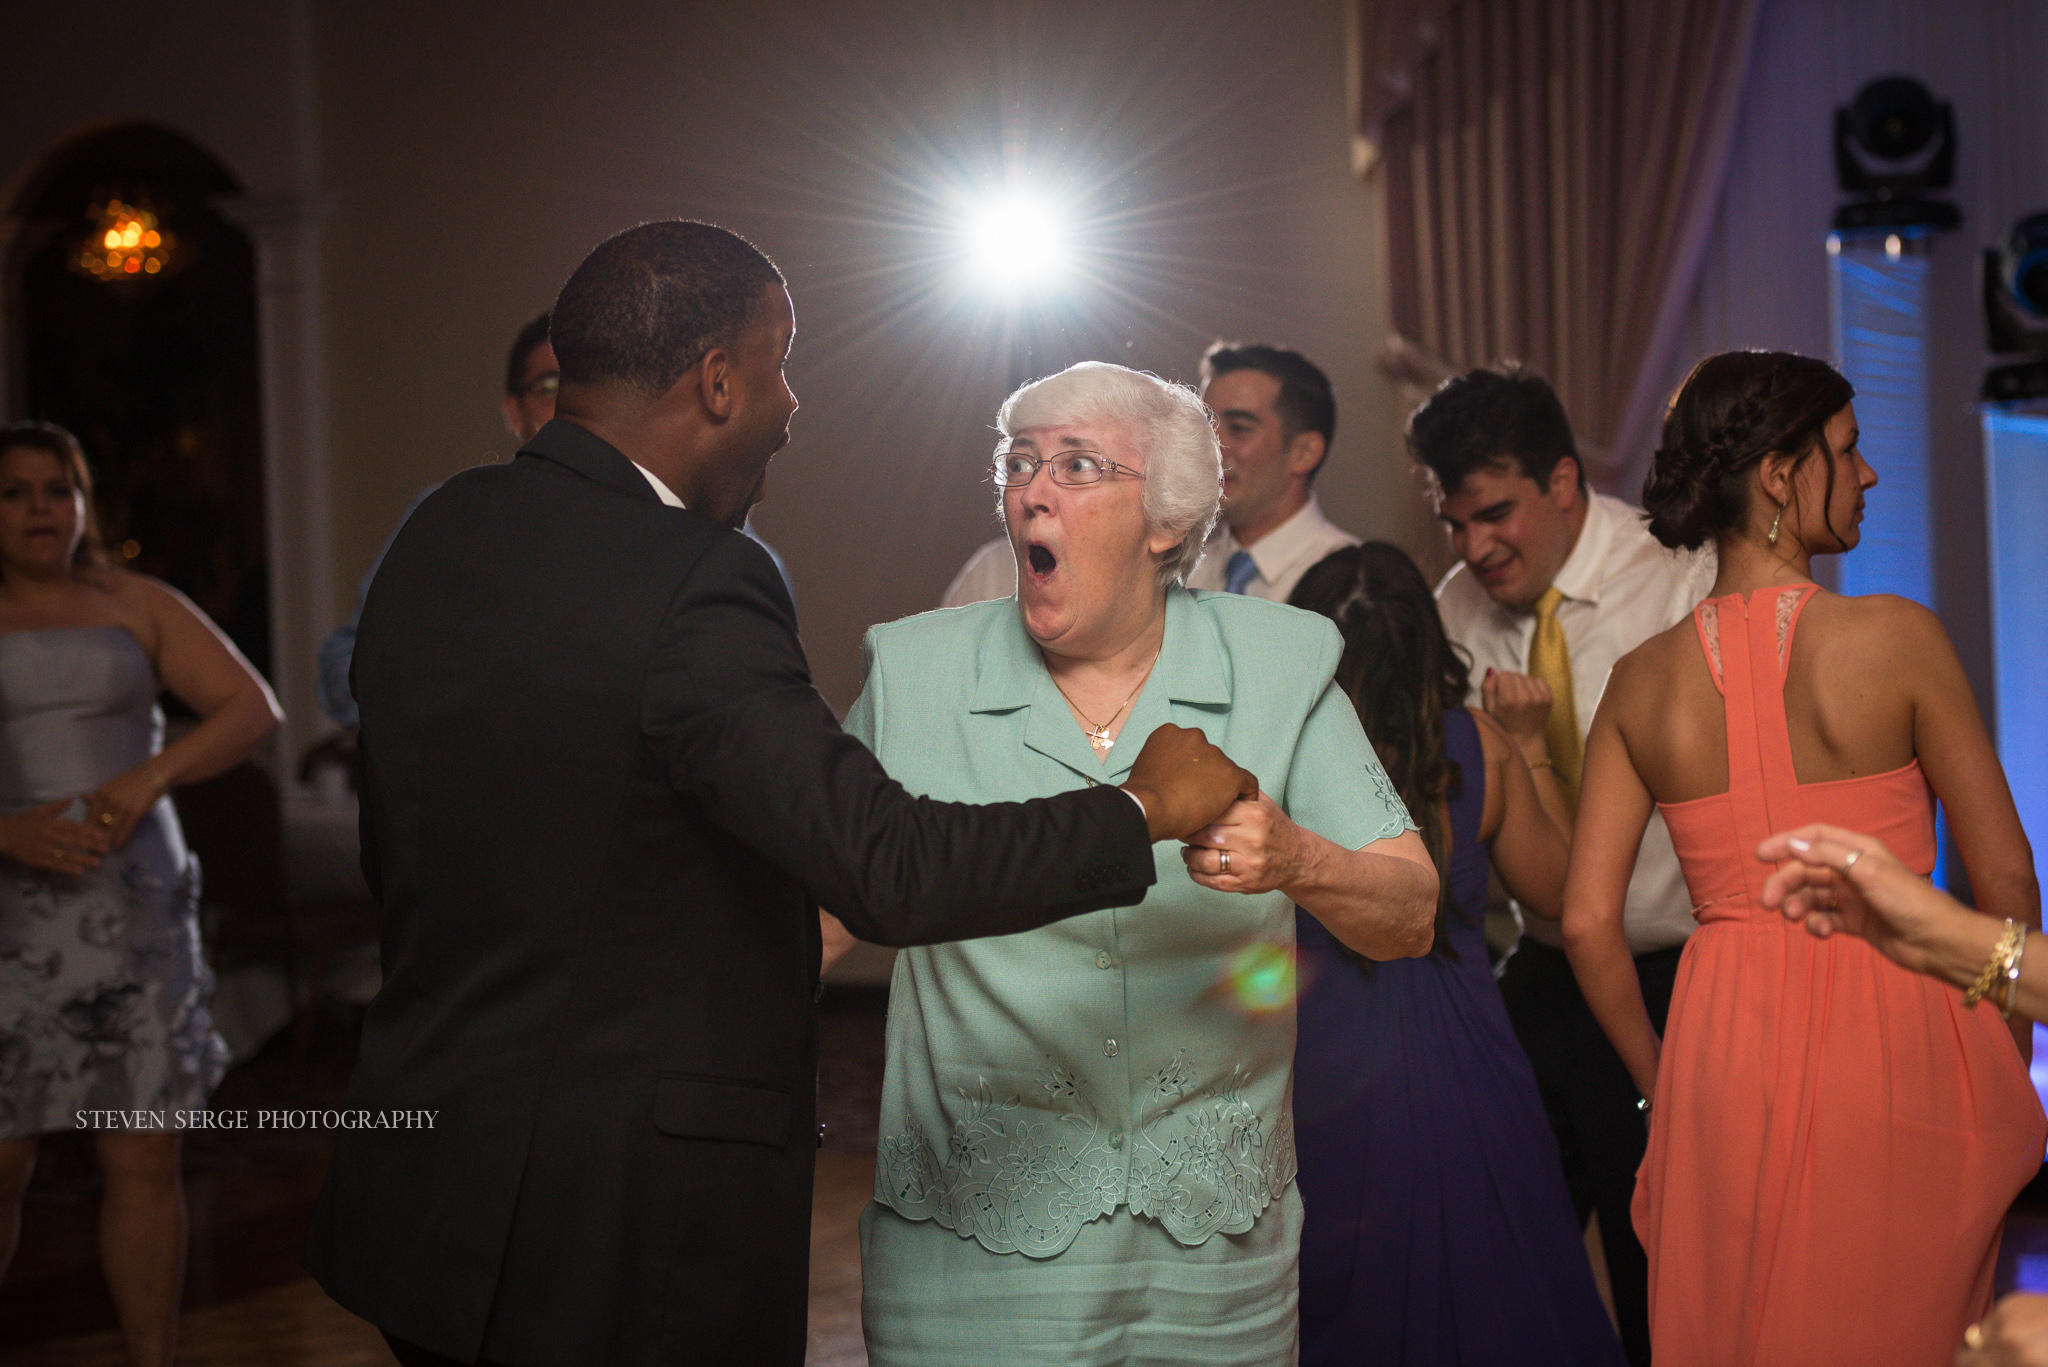 Scranton-wedding-photographer-fiorellis-steven-serge-70.jpg